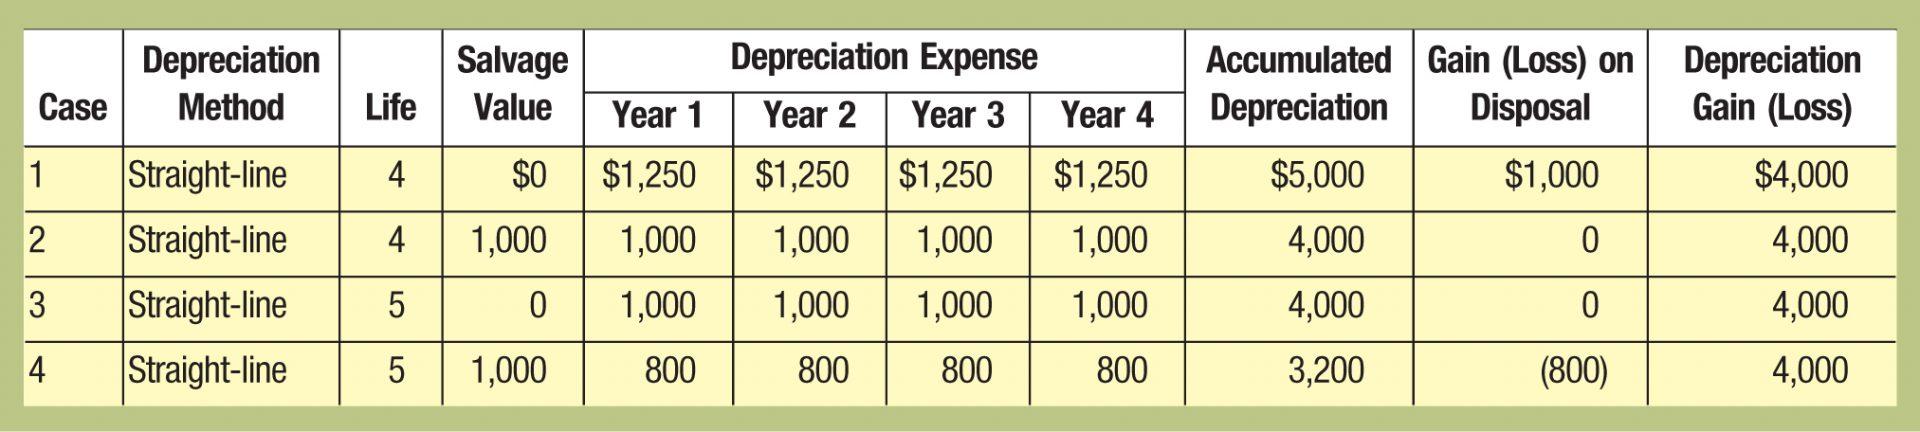 Case; Depreciation Method; Life; Salvage Value; Depreciation Expense; Accumulated Depreciation; Gain (Loss) on Disposal; Depreciation Gain (Loss) Year 1; Year 2; Year 3; Year 4 1; Straight-line; 4; %image_alt%; ,250; ,250; ,250; ,250; ,000; ,000; ,000 2; Straight-line; 4; 1,000; 1,000; 1,000; 1,000; 1,000; 4,000; 0; 4,000 3; Straight-line; 5; 0; 1,000; 1,000; 1,000; 1,000; 4,000; 0; 4,000 4; Straight-line; 5; 1,000; 800; 800; 800; 800; 3,200; (800); 4,000